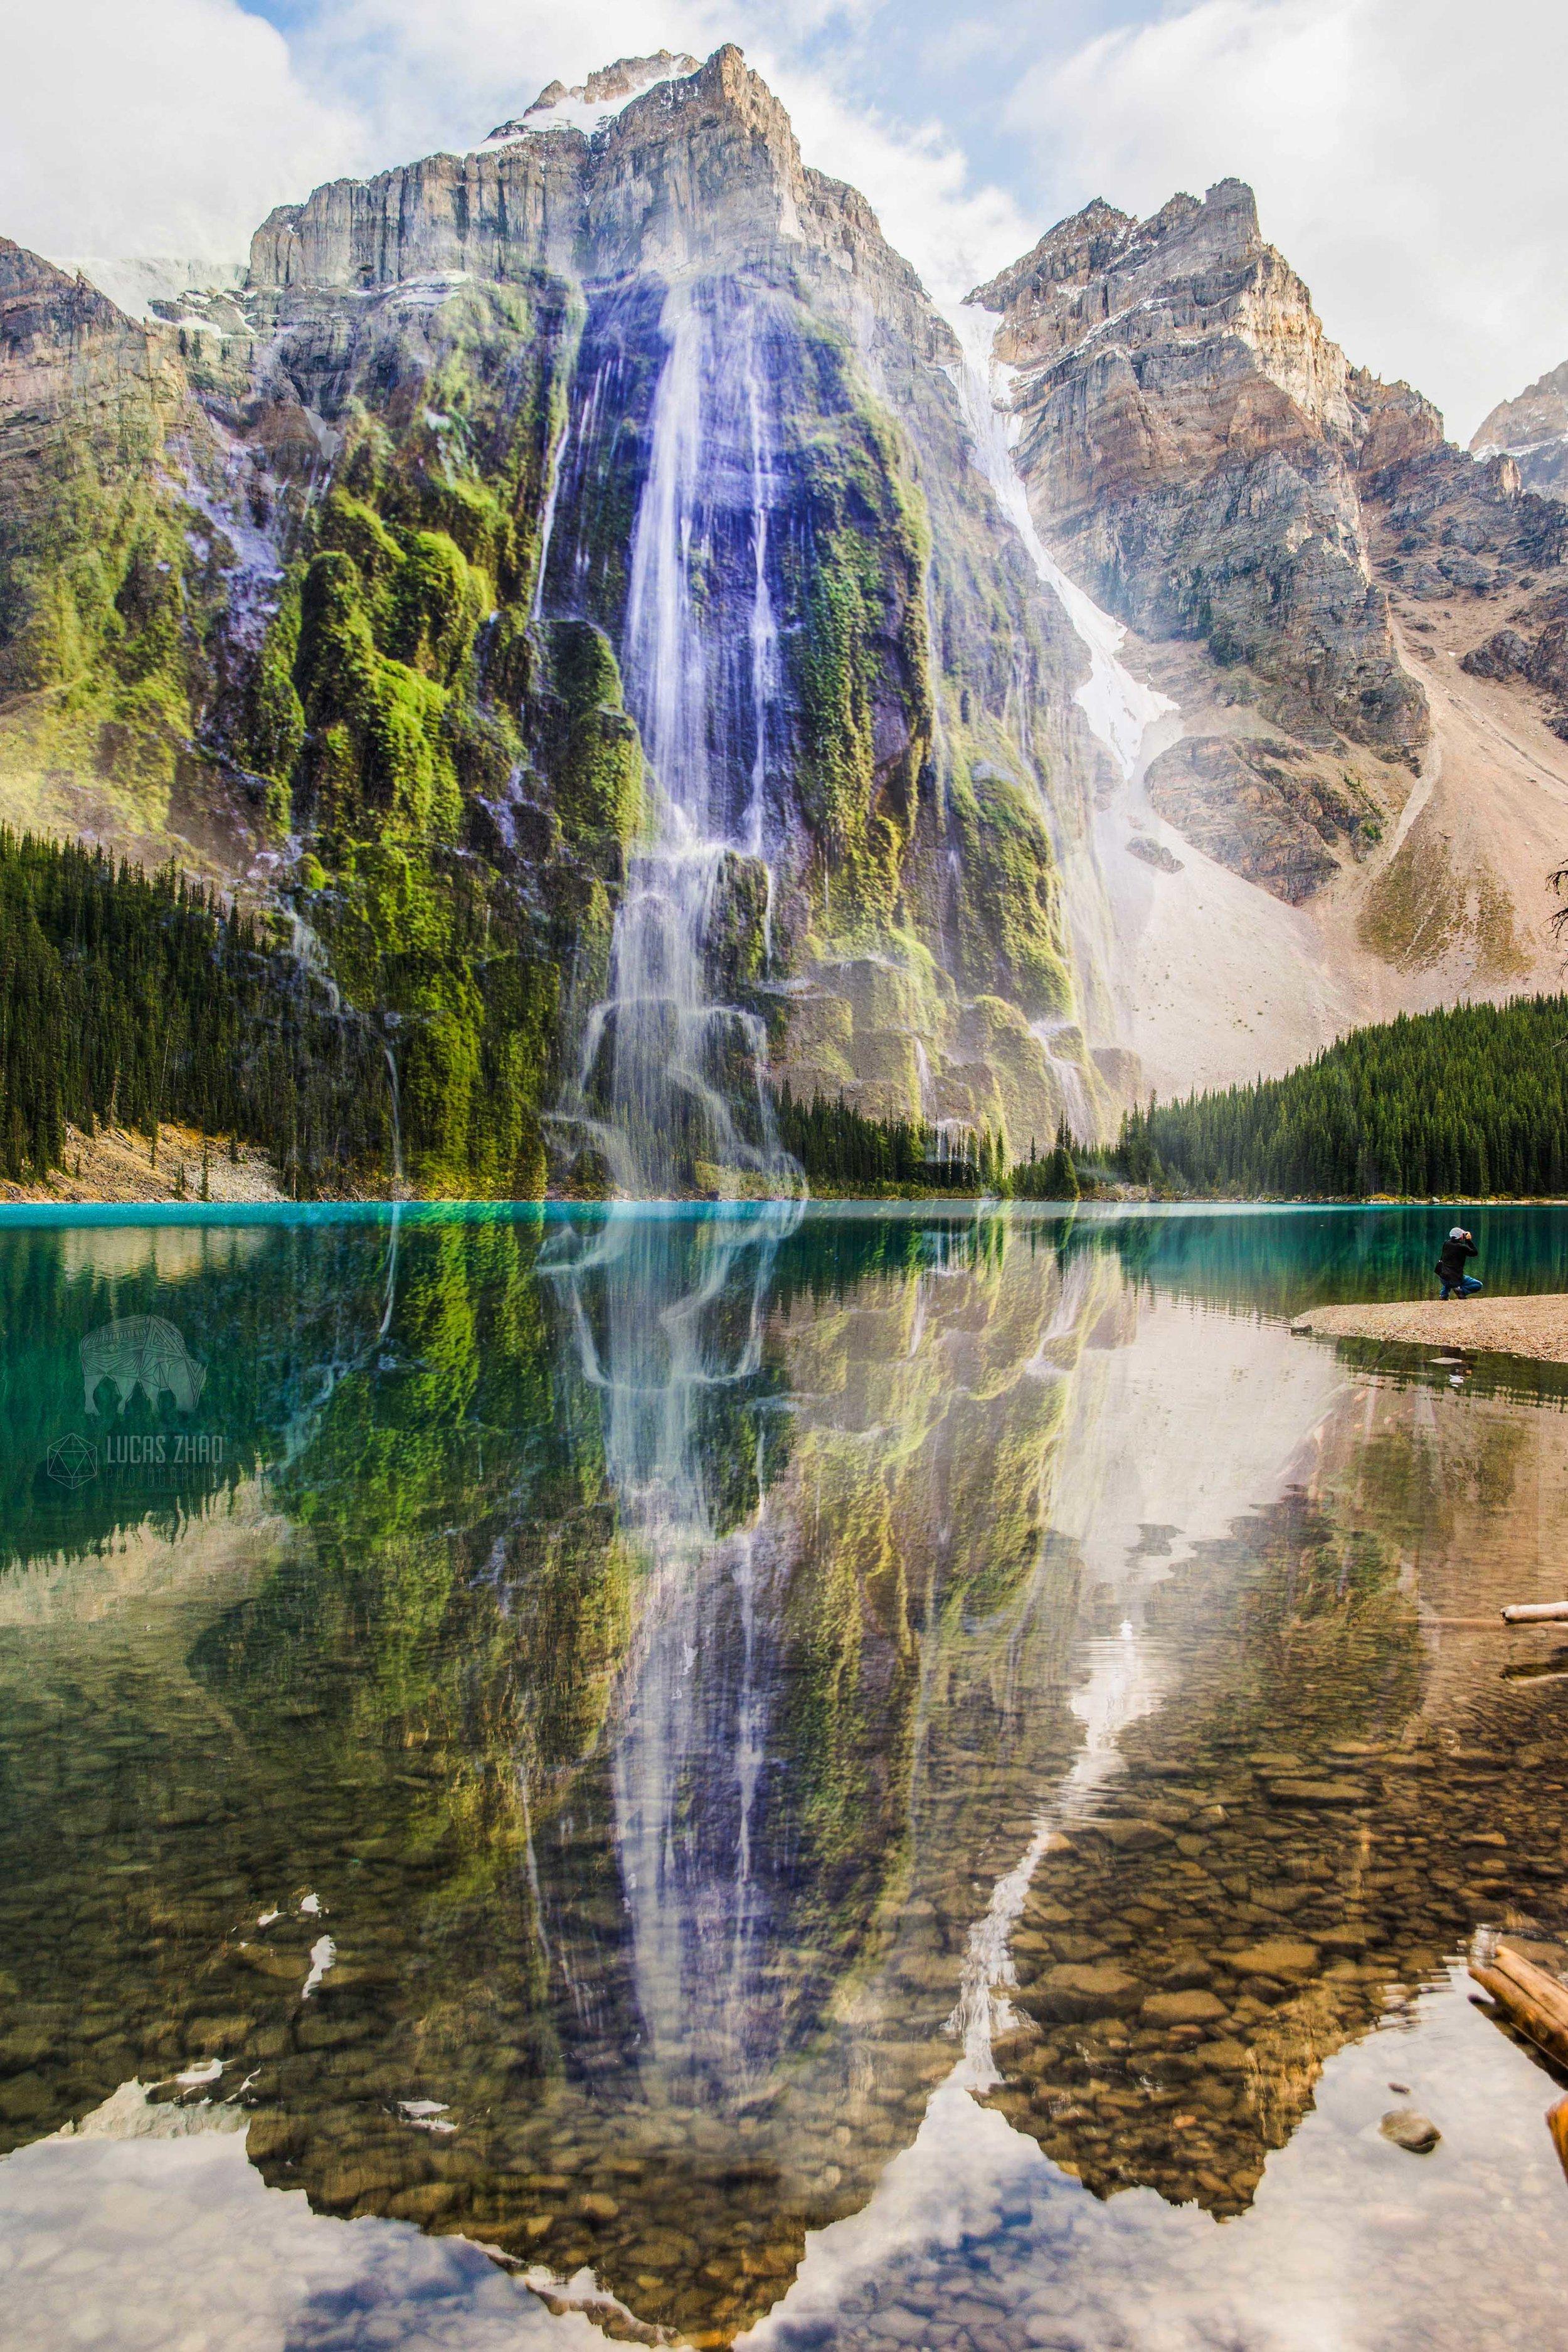 EternalFountainsmallerwater.jpg